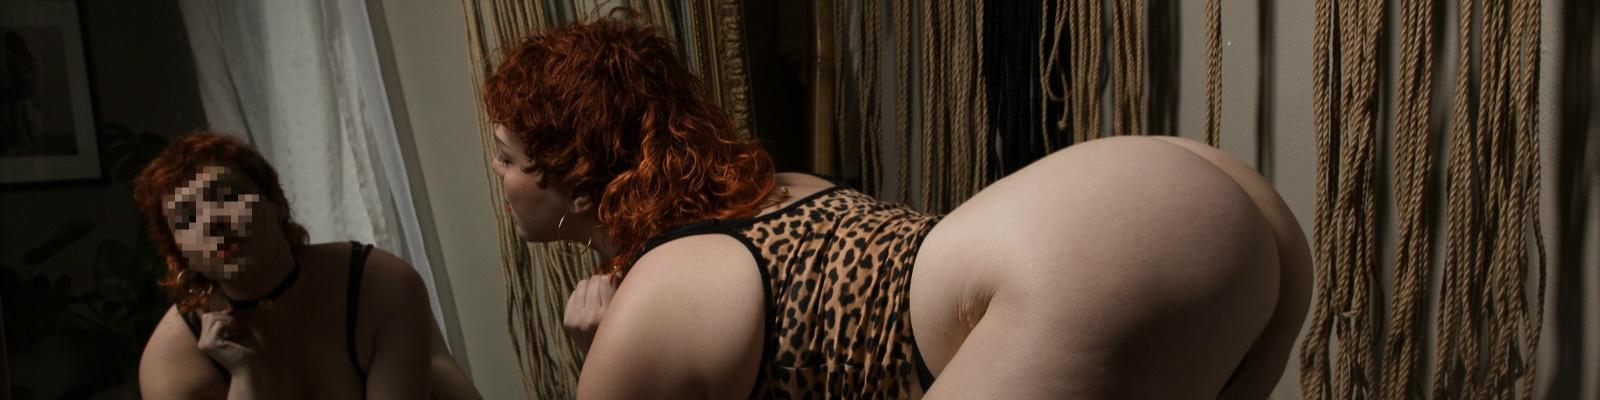 Nicolette Page's Cover Photo